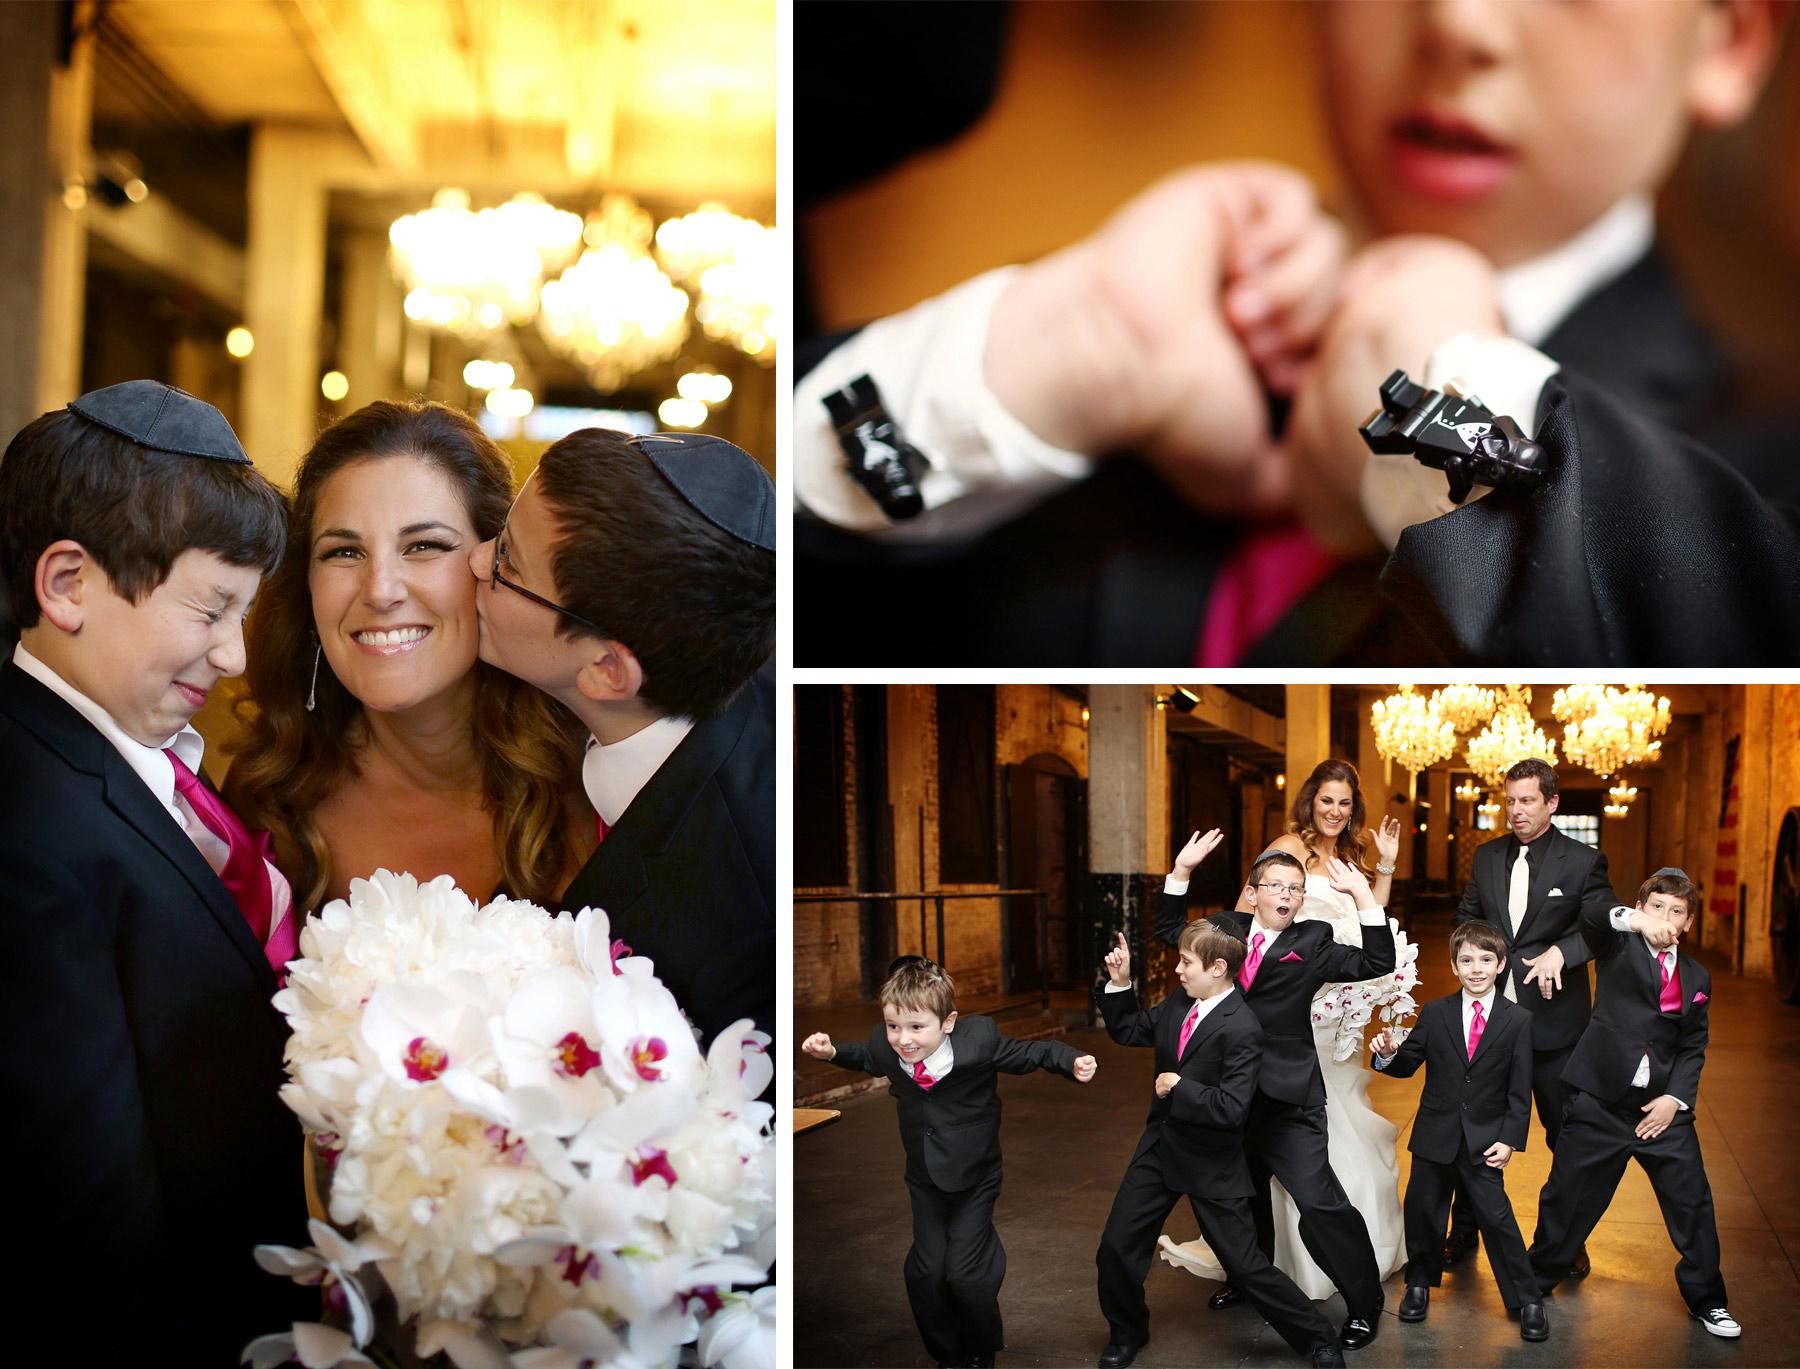 07-Minneapolis-Minnesota-Wedding-Photography-by-Vick-Photography-Aria-Downtown-Ceremony-Layne-&-Dan.jpg